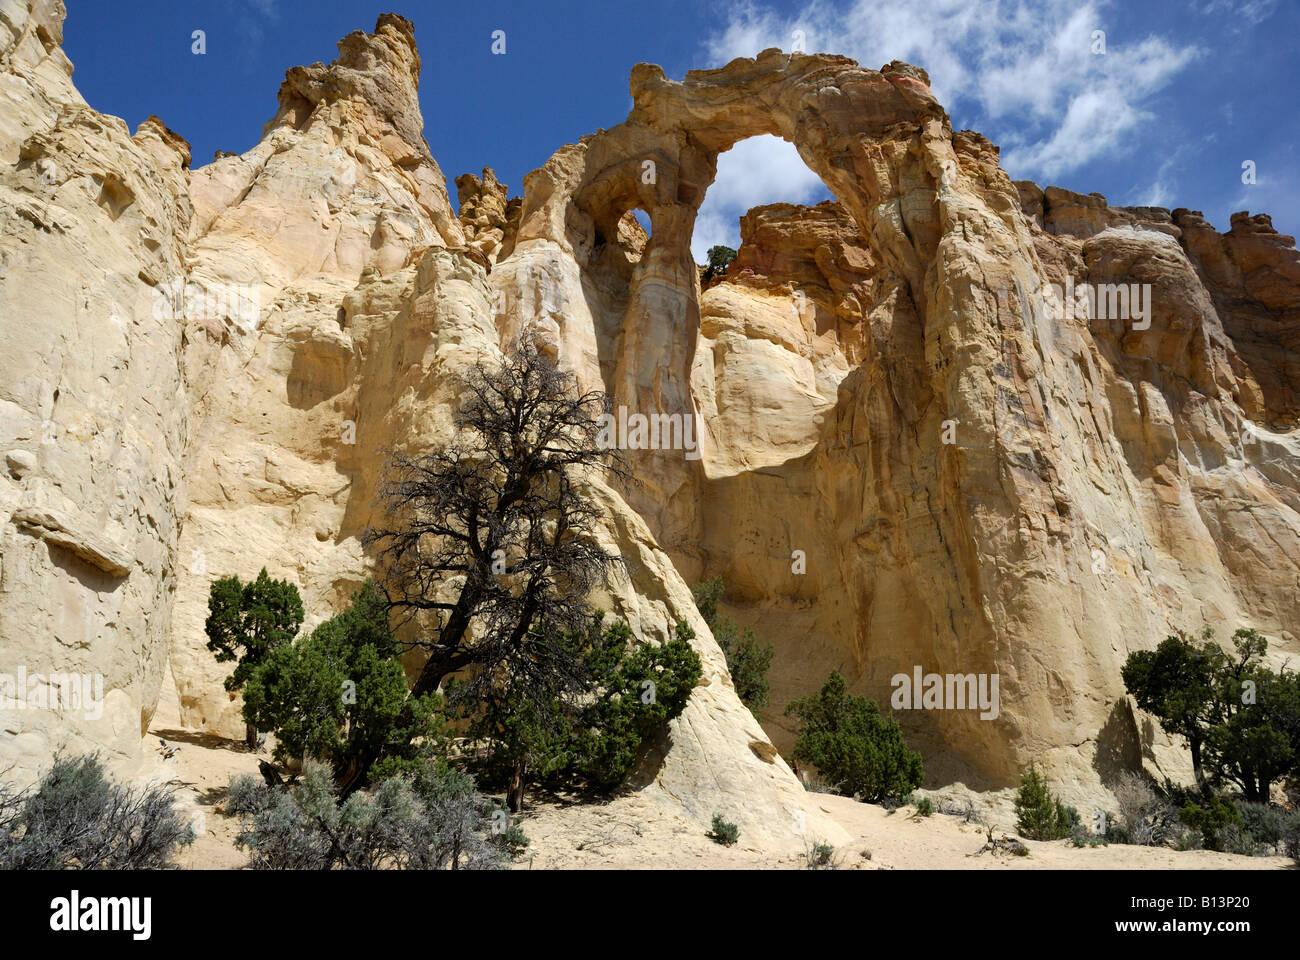 Grosvenor Arch near Kodachrome Basin State Park Utah Stock Photo